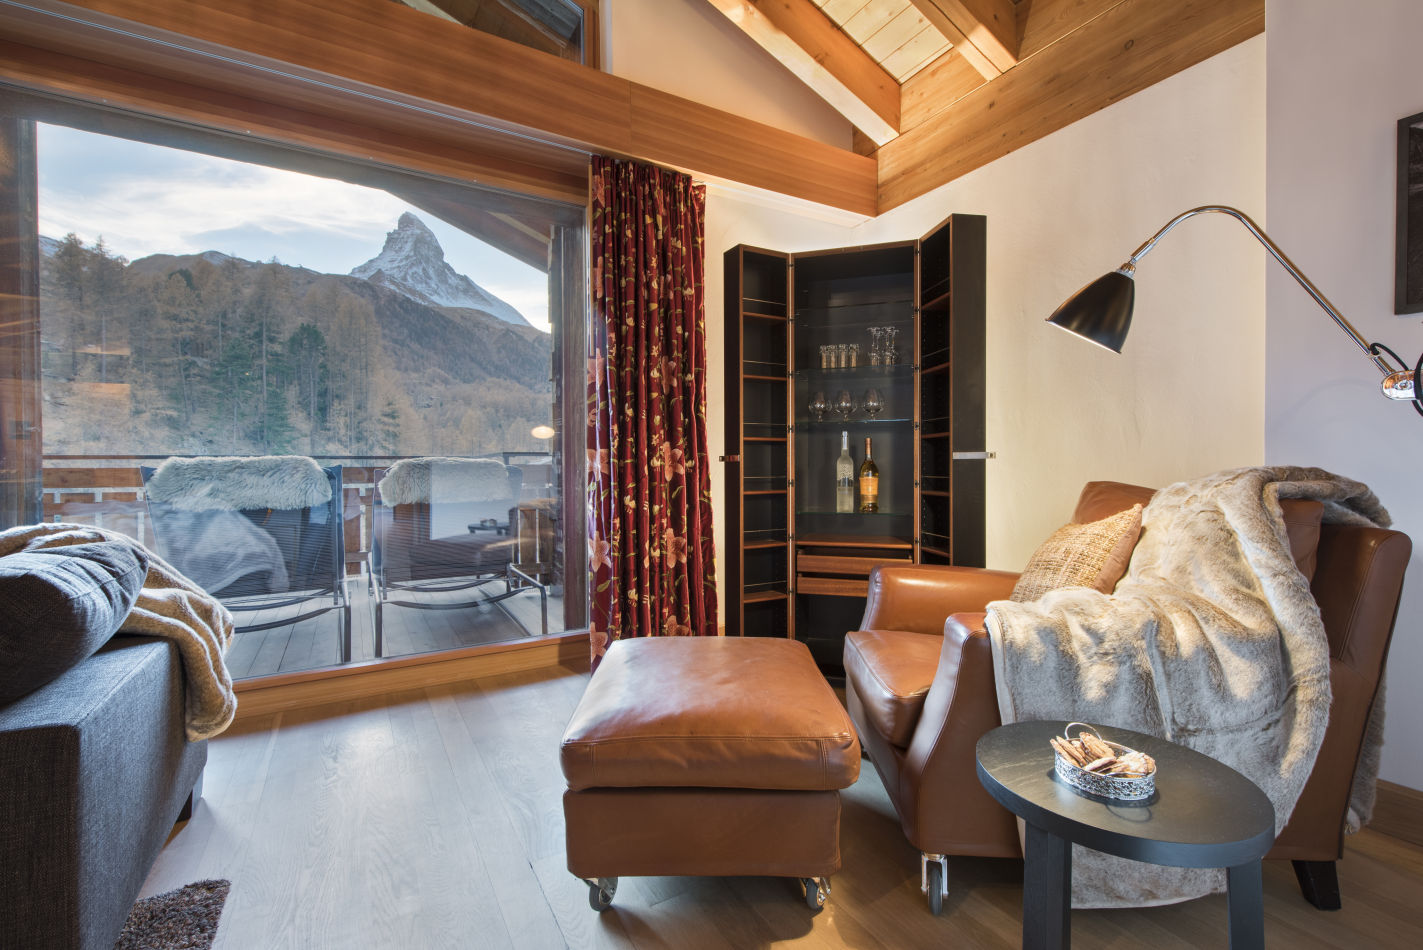 The view of Zermatt's Matterhorn can be seen peering through one of the bedroom's of Chalet Shalimar